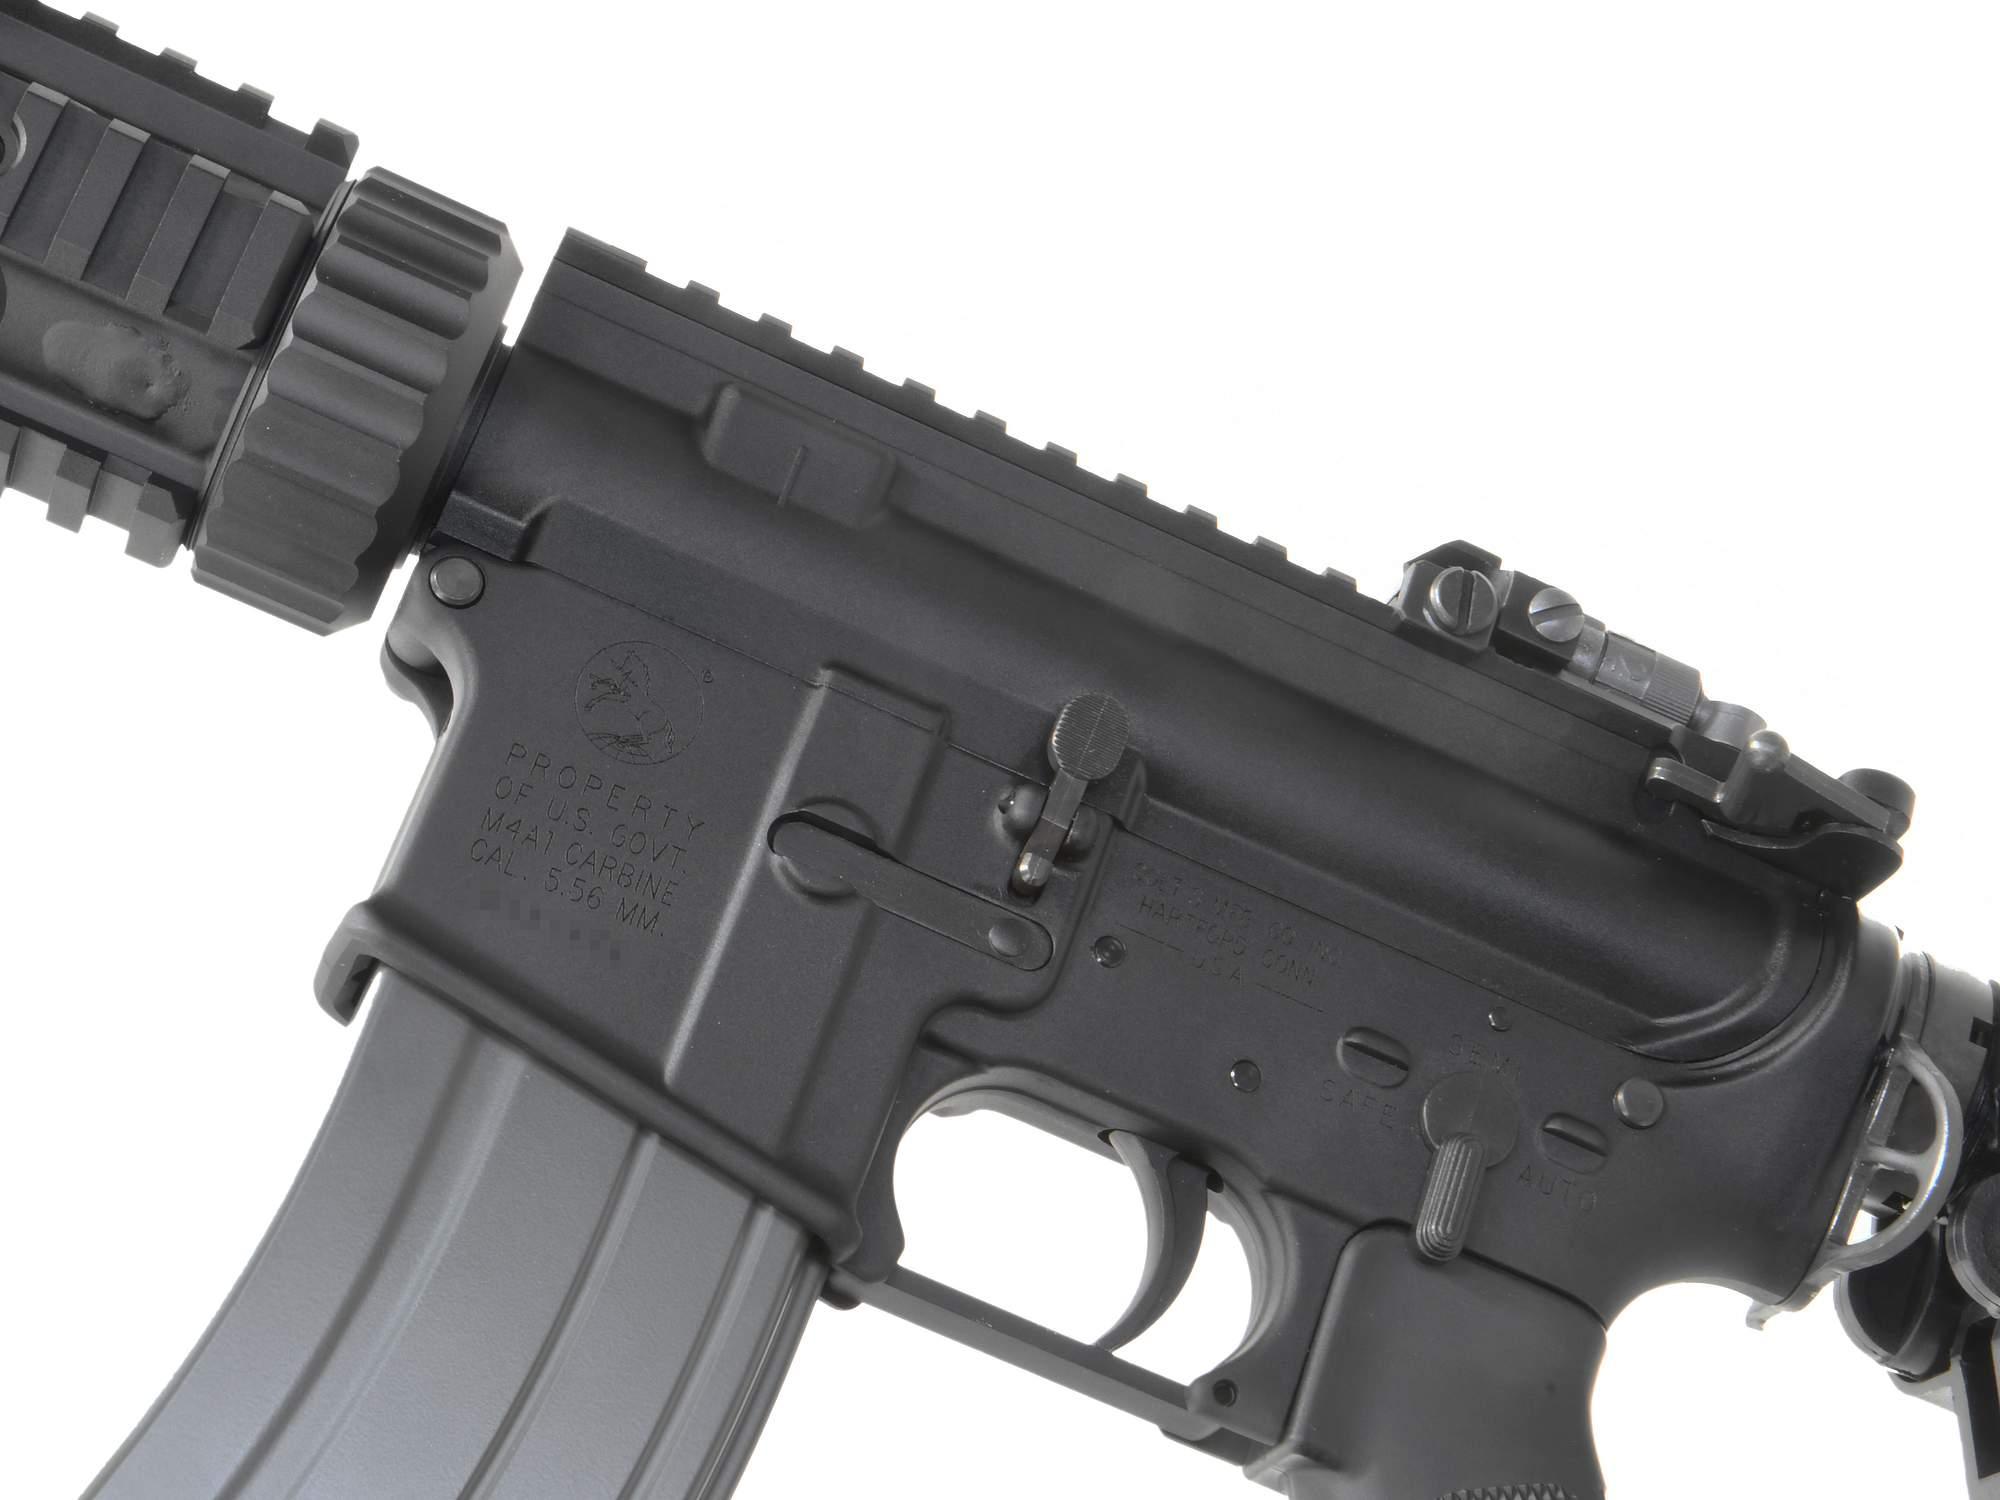 CyberGun Colt MK12 MOD1 GBBR V2 (JPver.) [ガスガン]